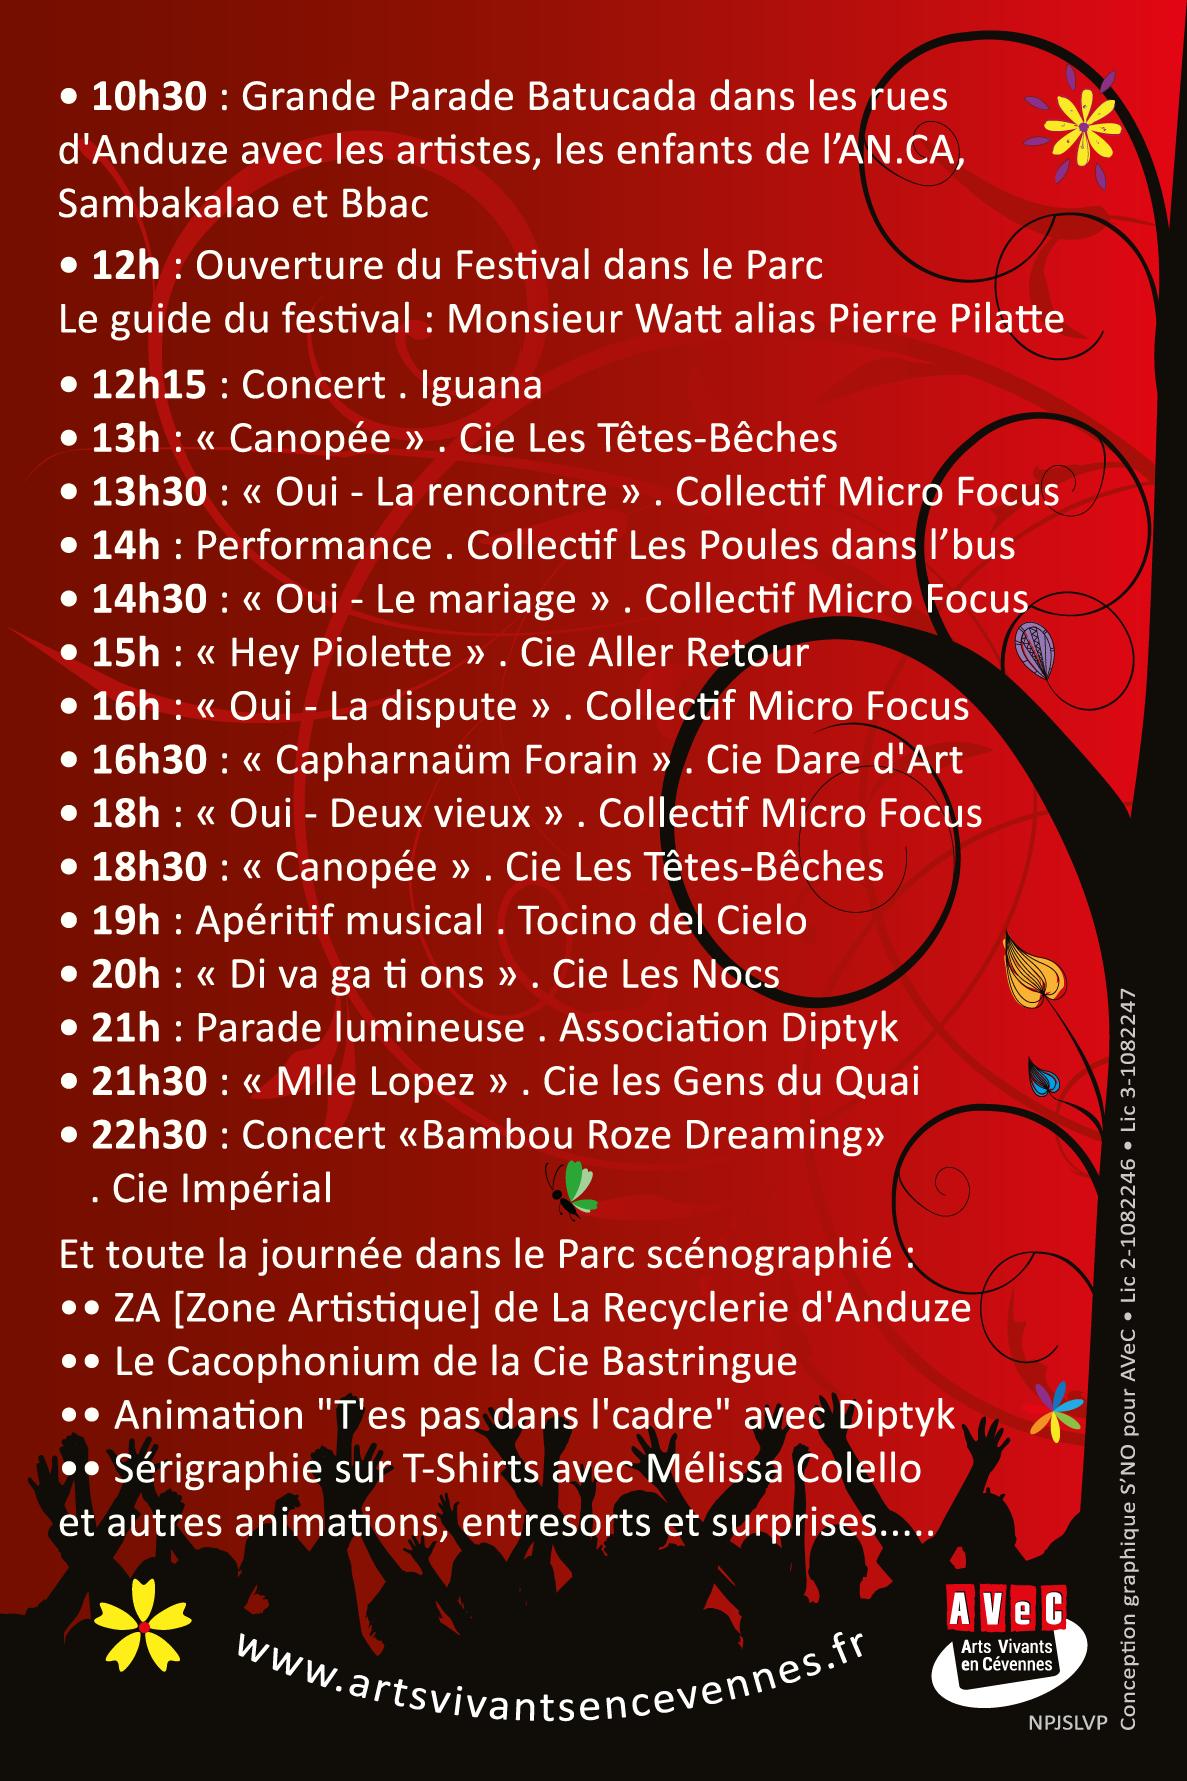 Festival AVeC'envie#2 - Programme - 07.05.2017